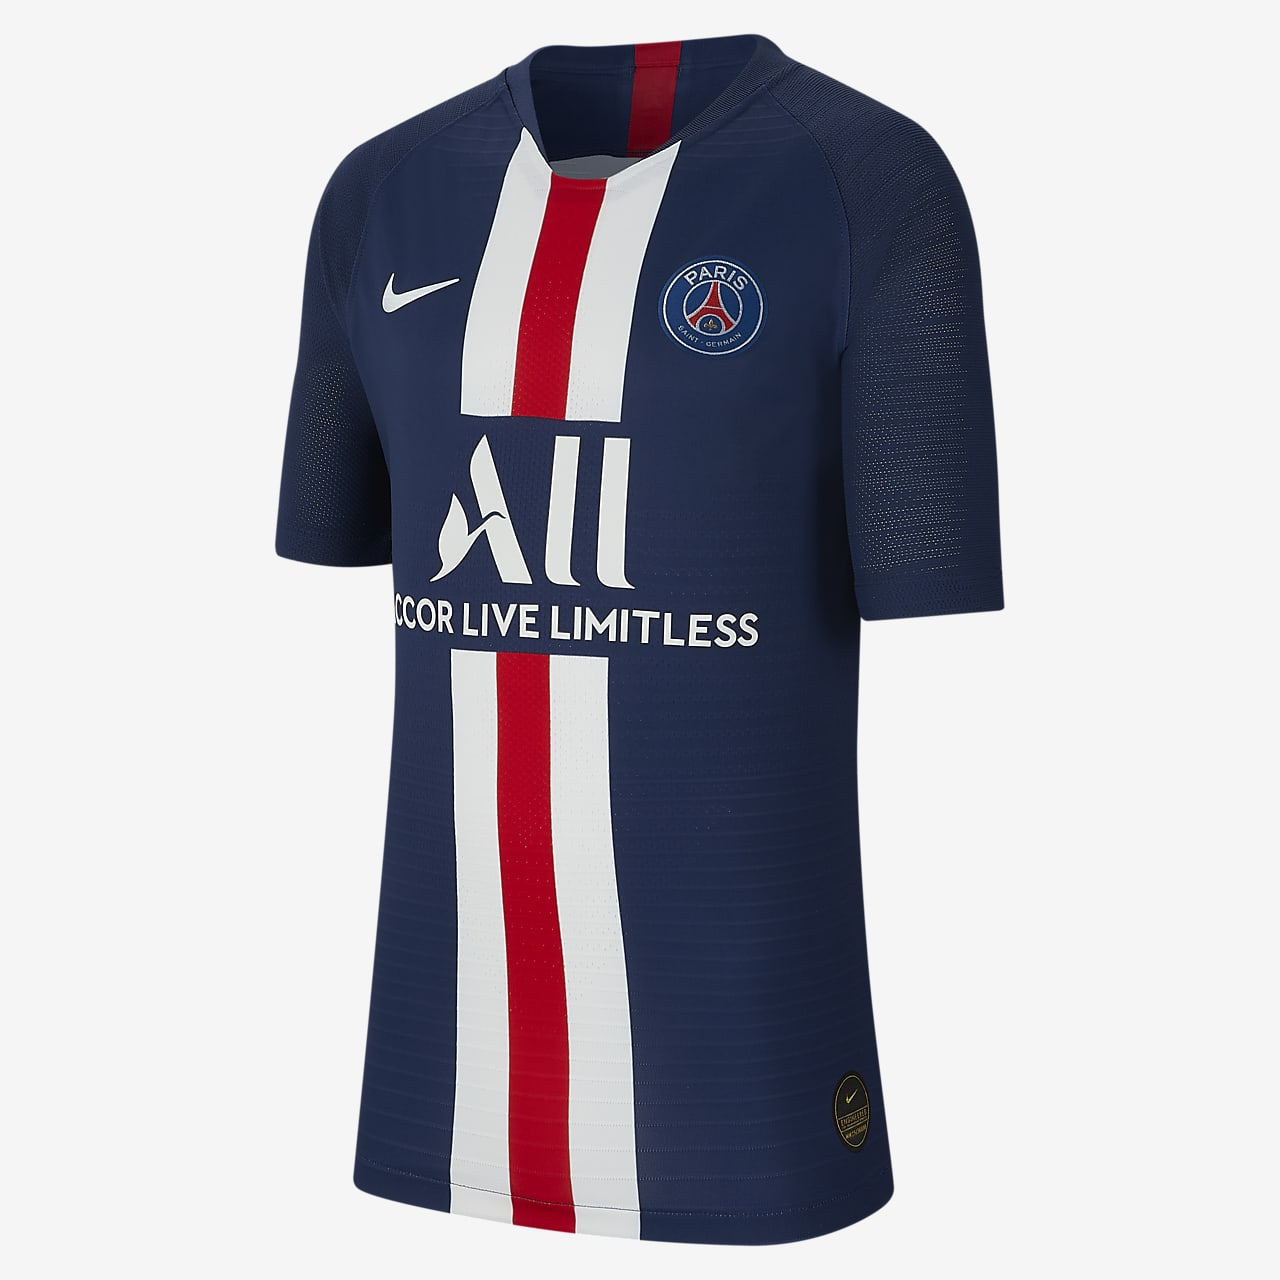 Paris Saint-Germain 2019/20 Vapor Match Home Voetbalshirt voor kids